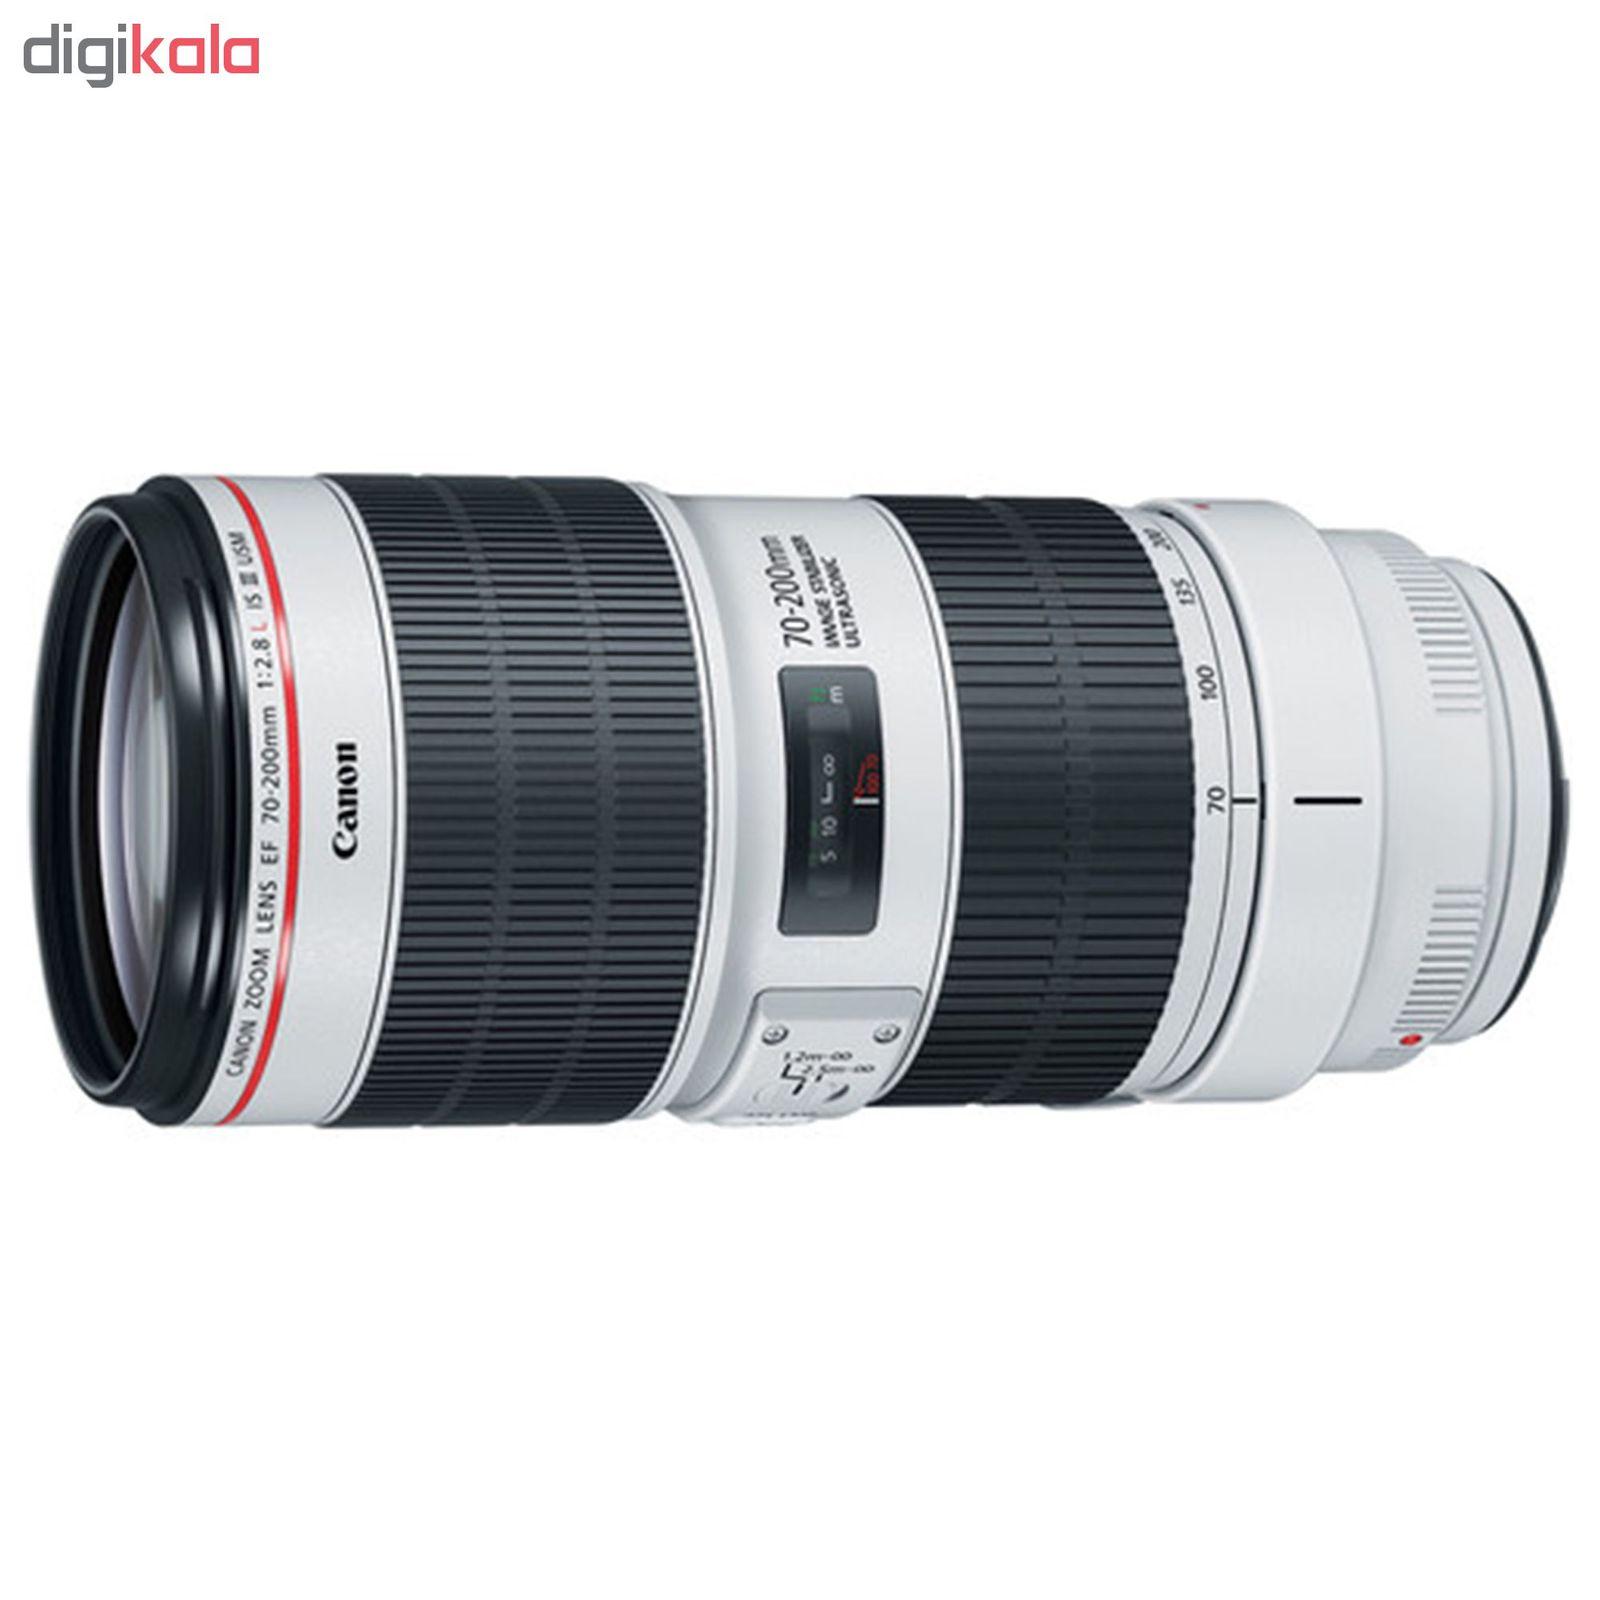 لنز کانن مدل EF 70-200mm f/2.8L IS III USM main 1 2